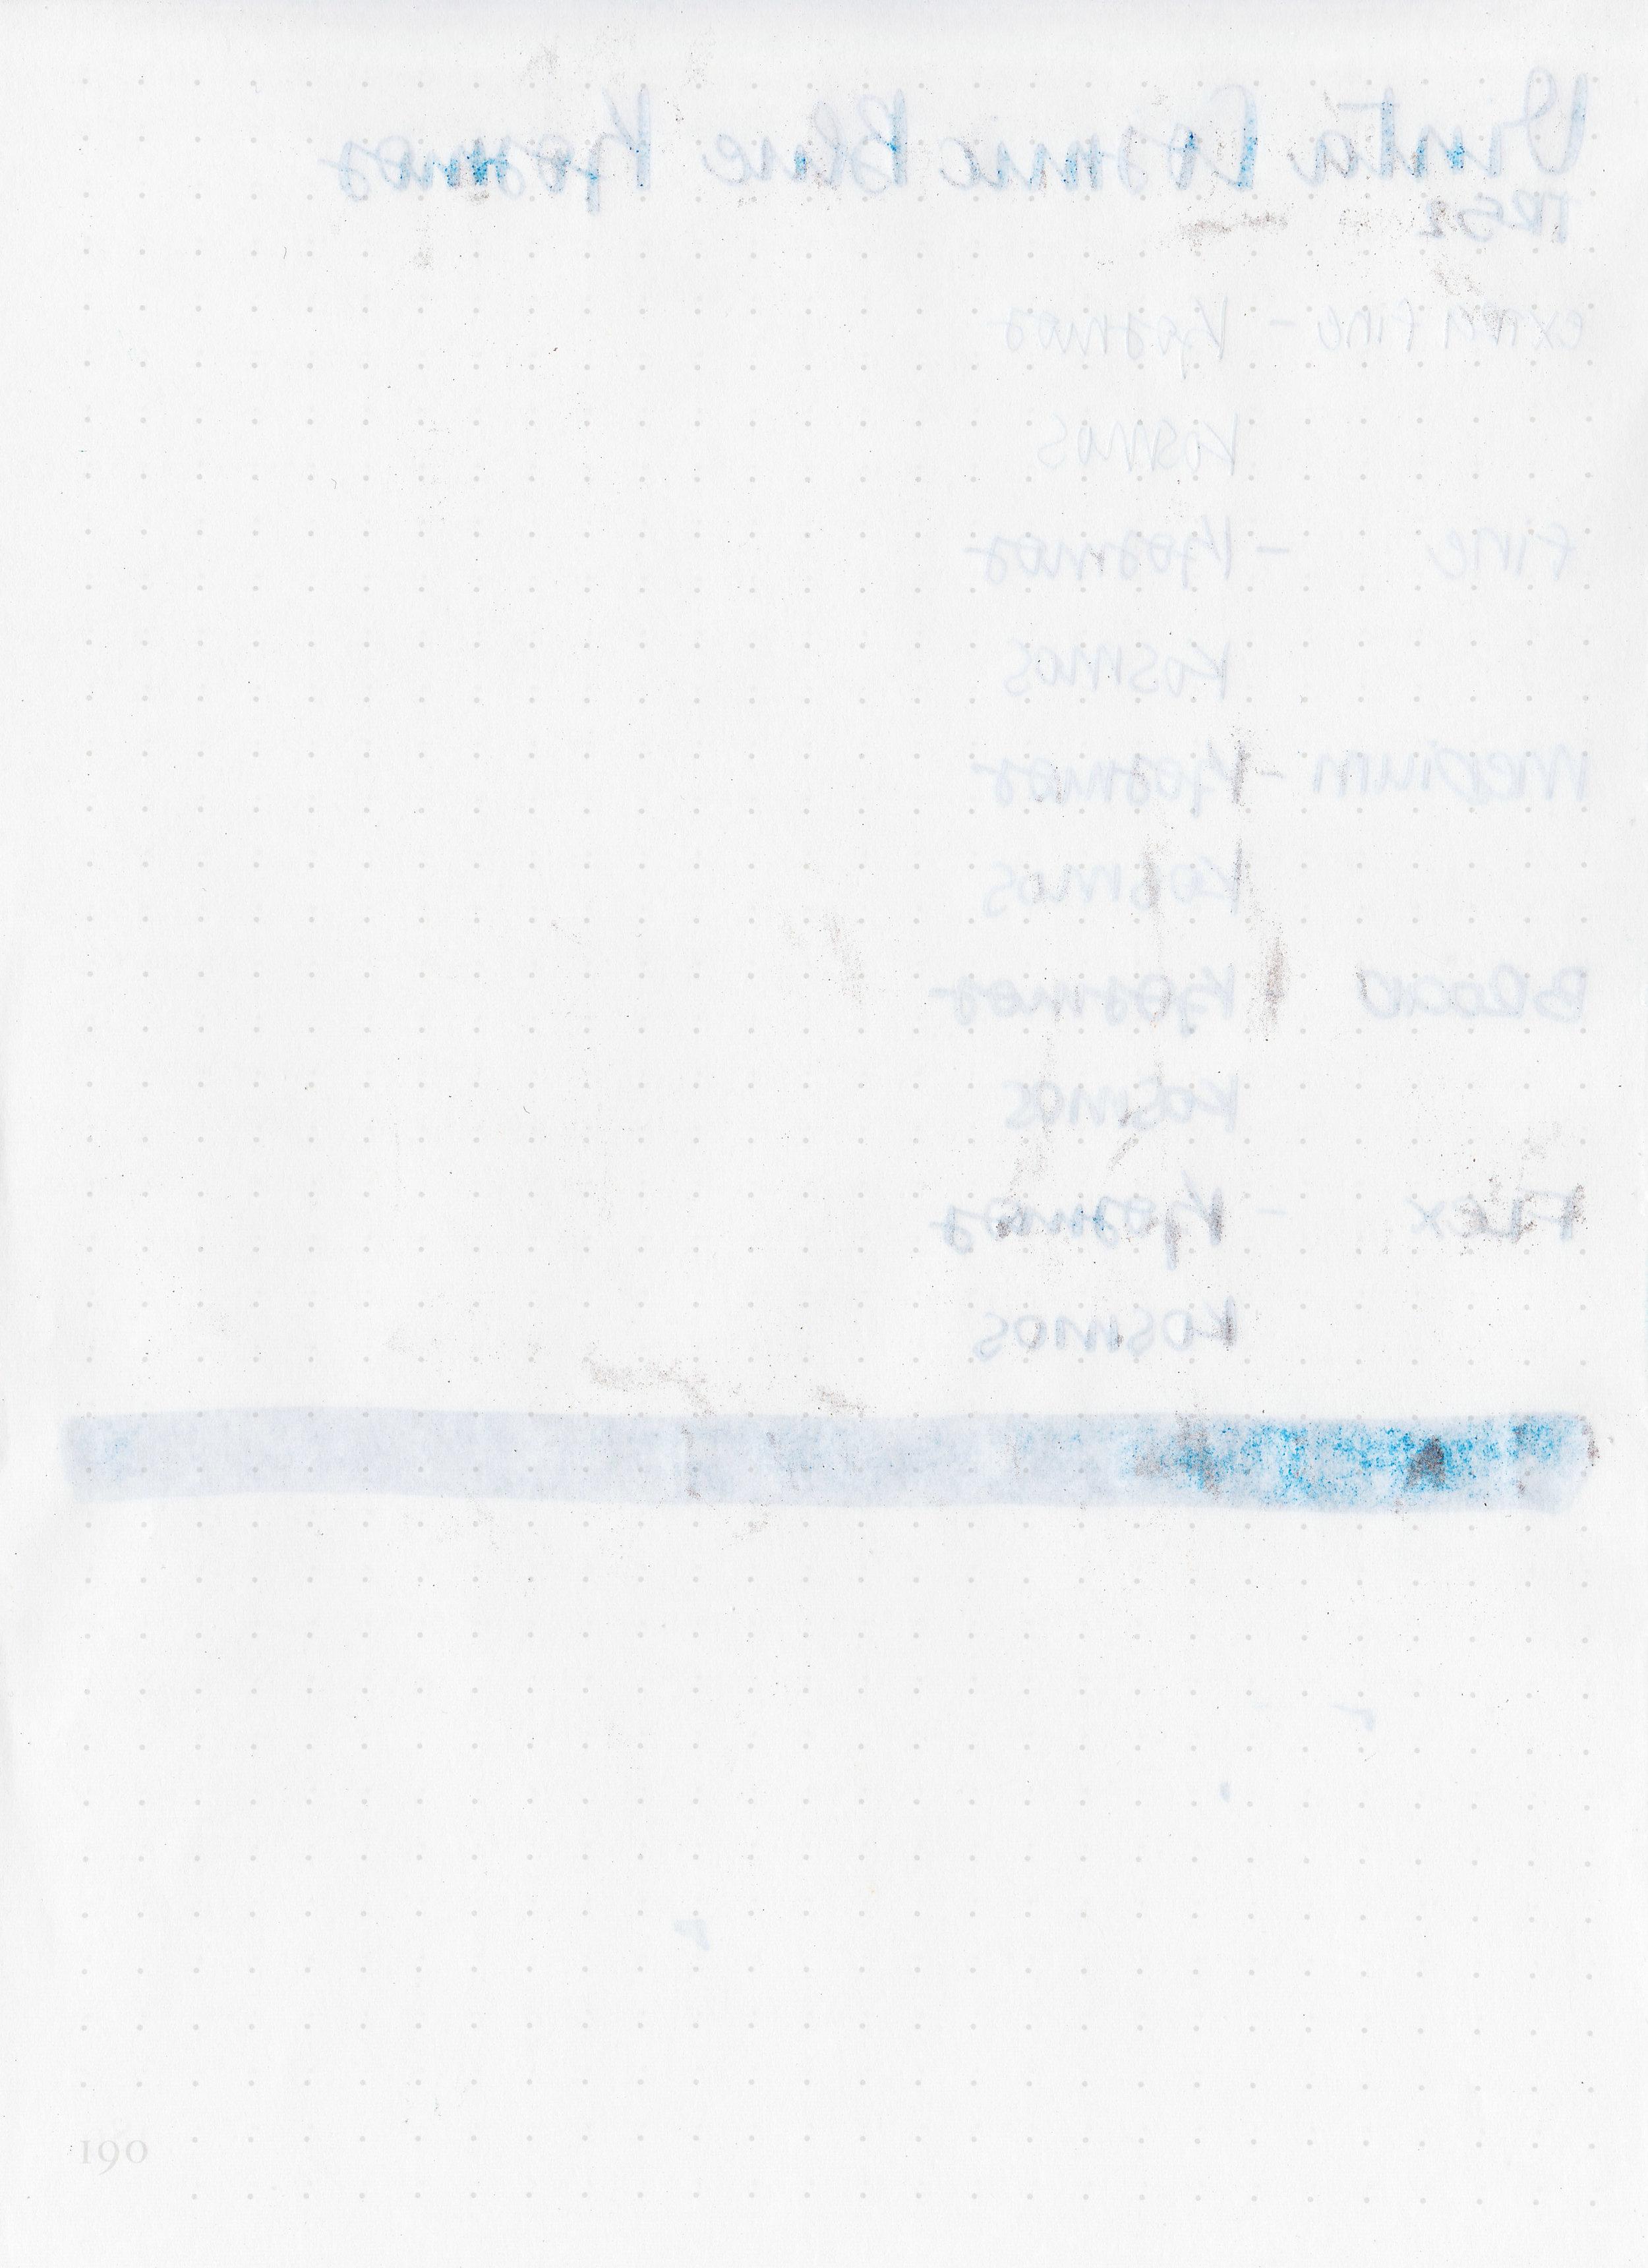 Ink Review #832: Vinta Cosmic Blue Kosmos 1955 — Mountain